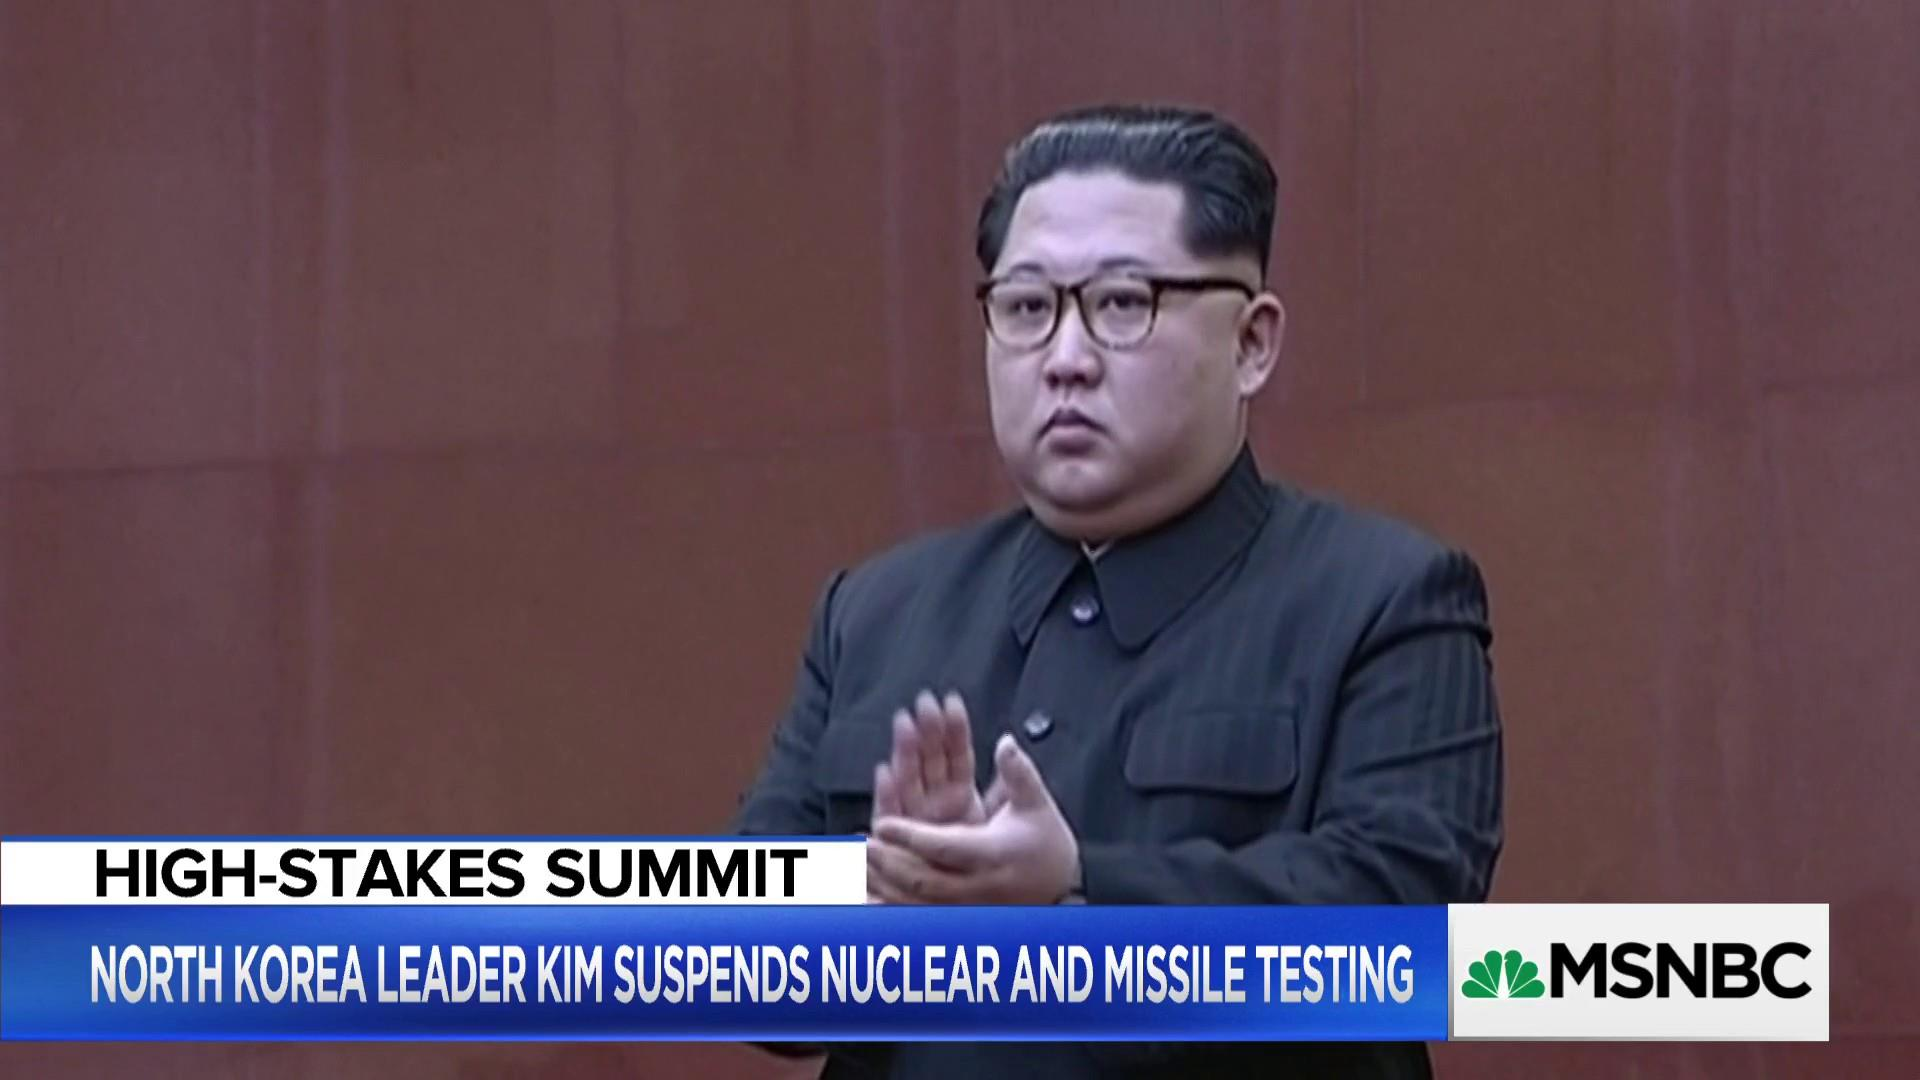 Failed talks with North Korea may lead to war